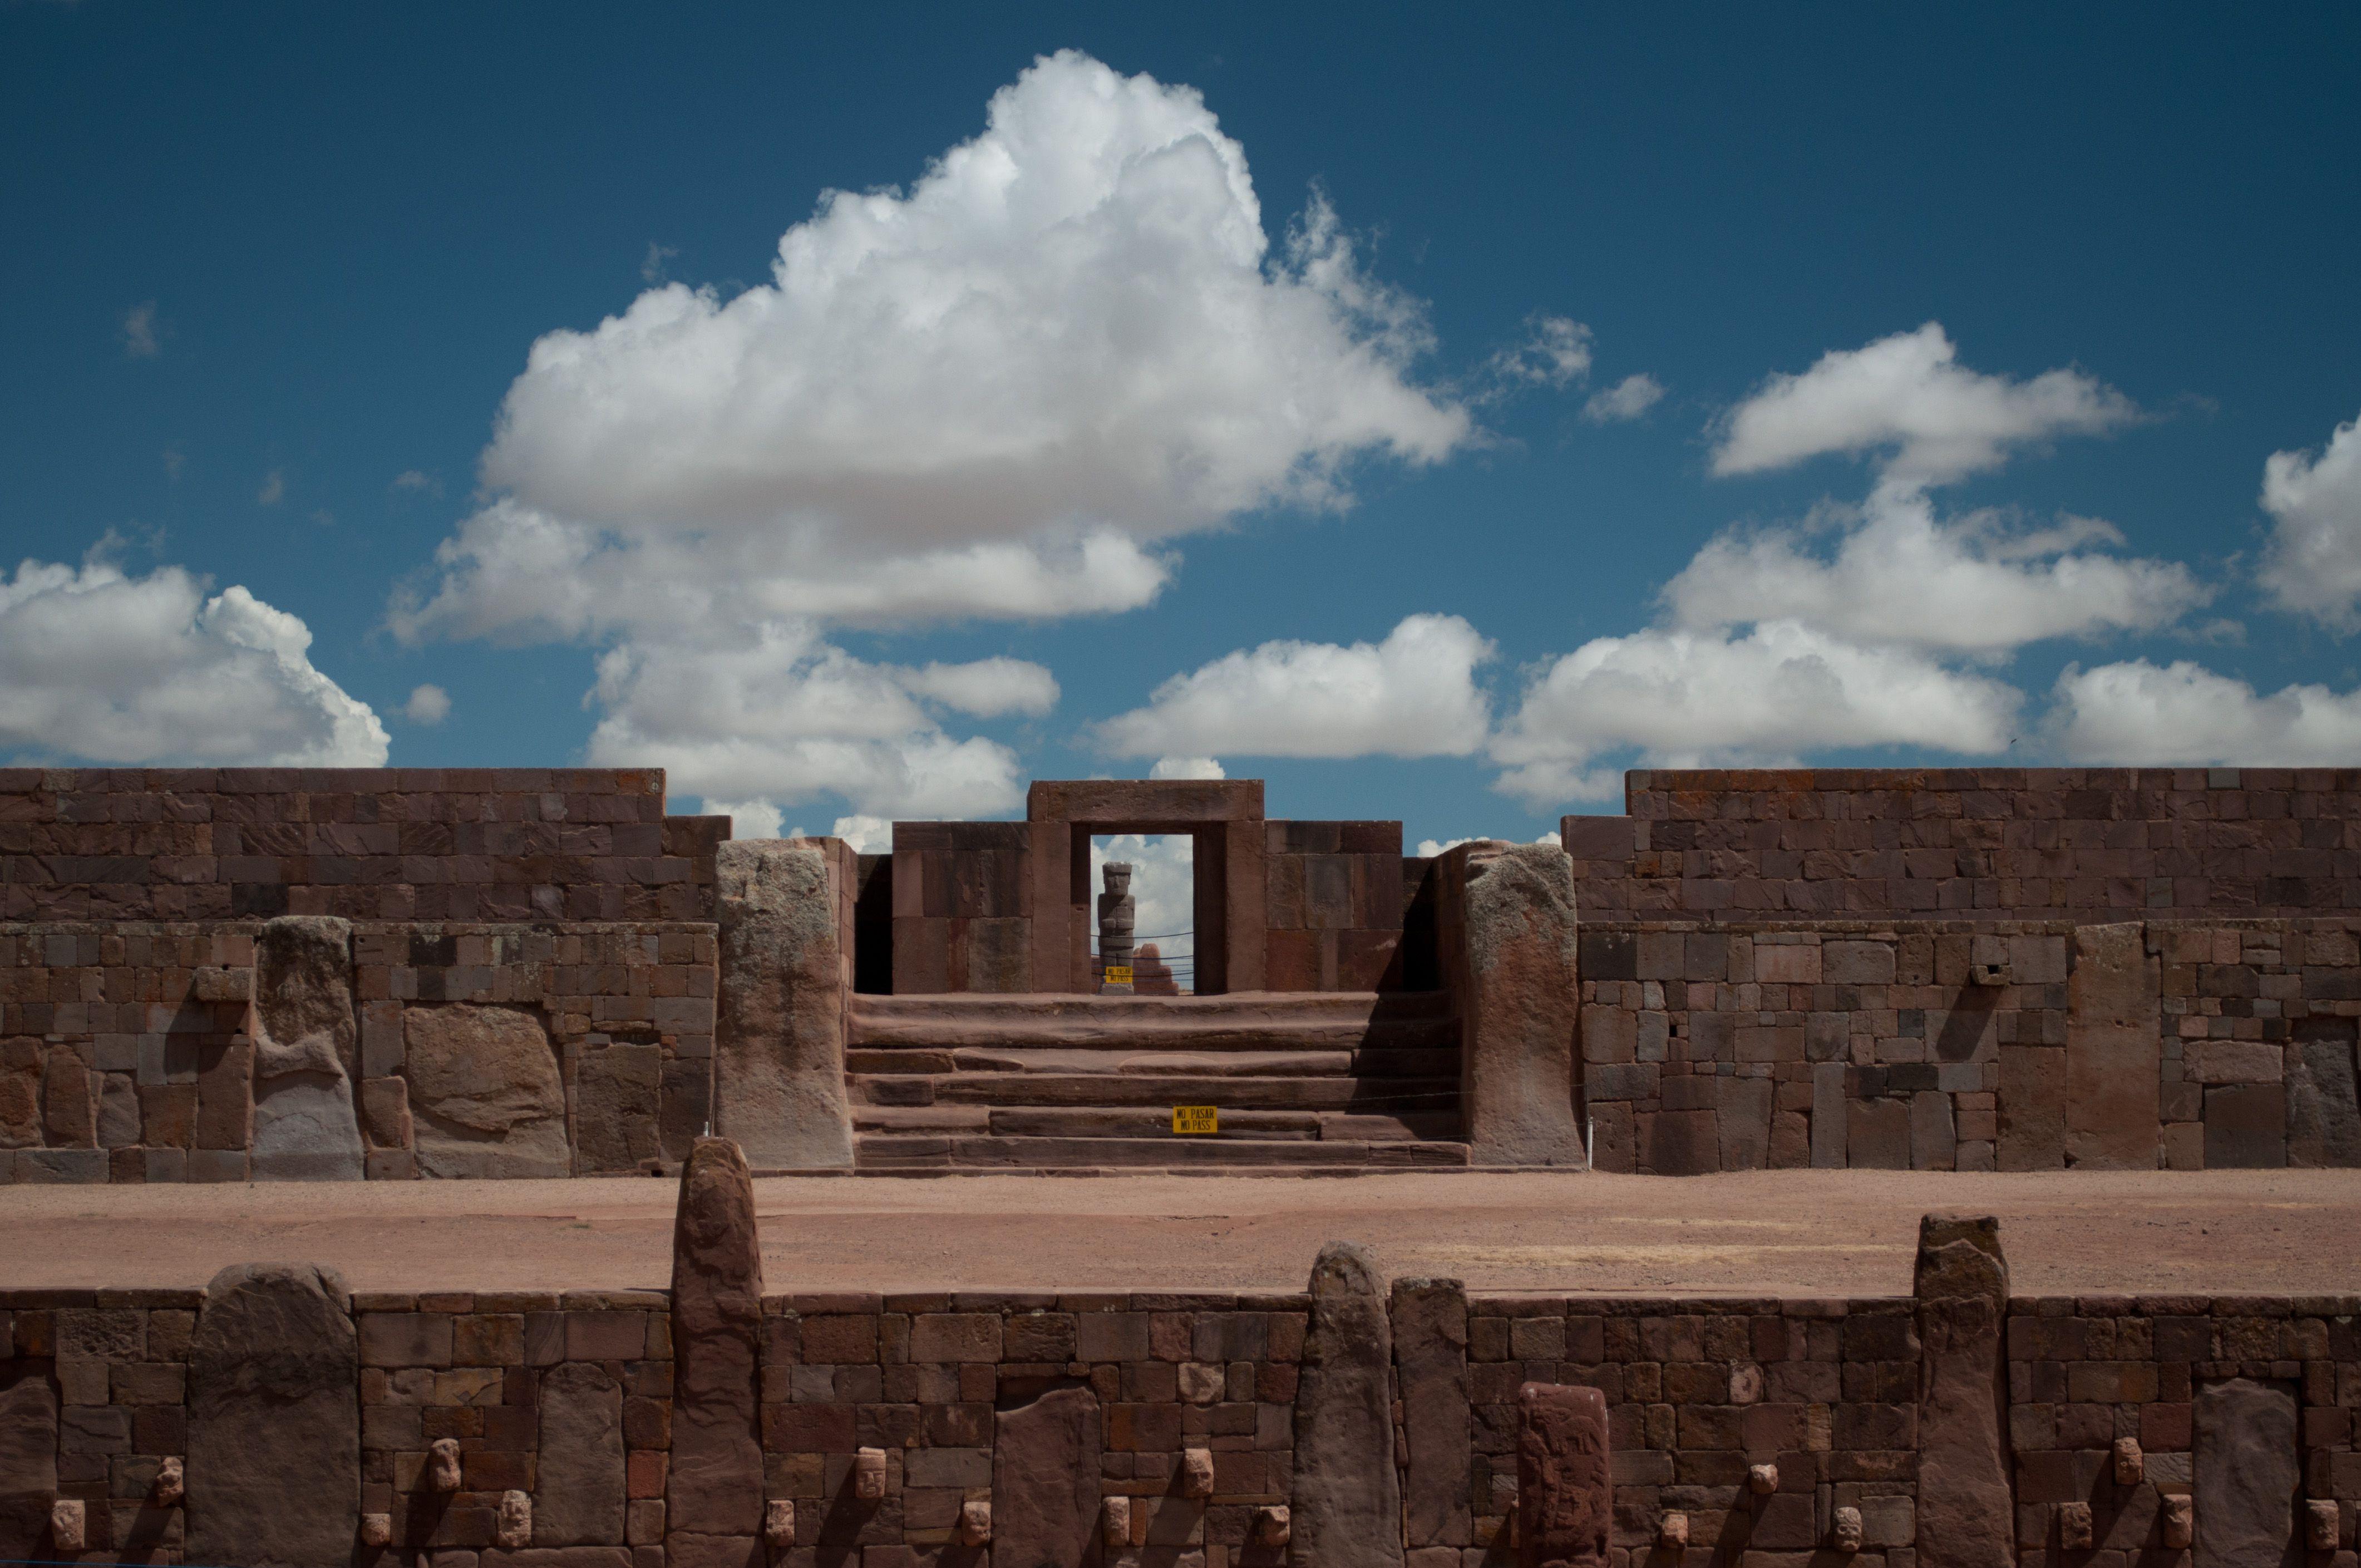 One of my vacation destinations. Tiahuanaco, Bolivia